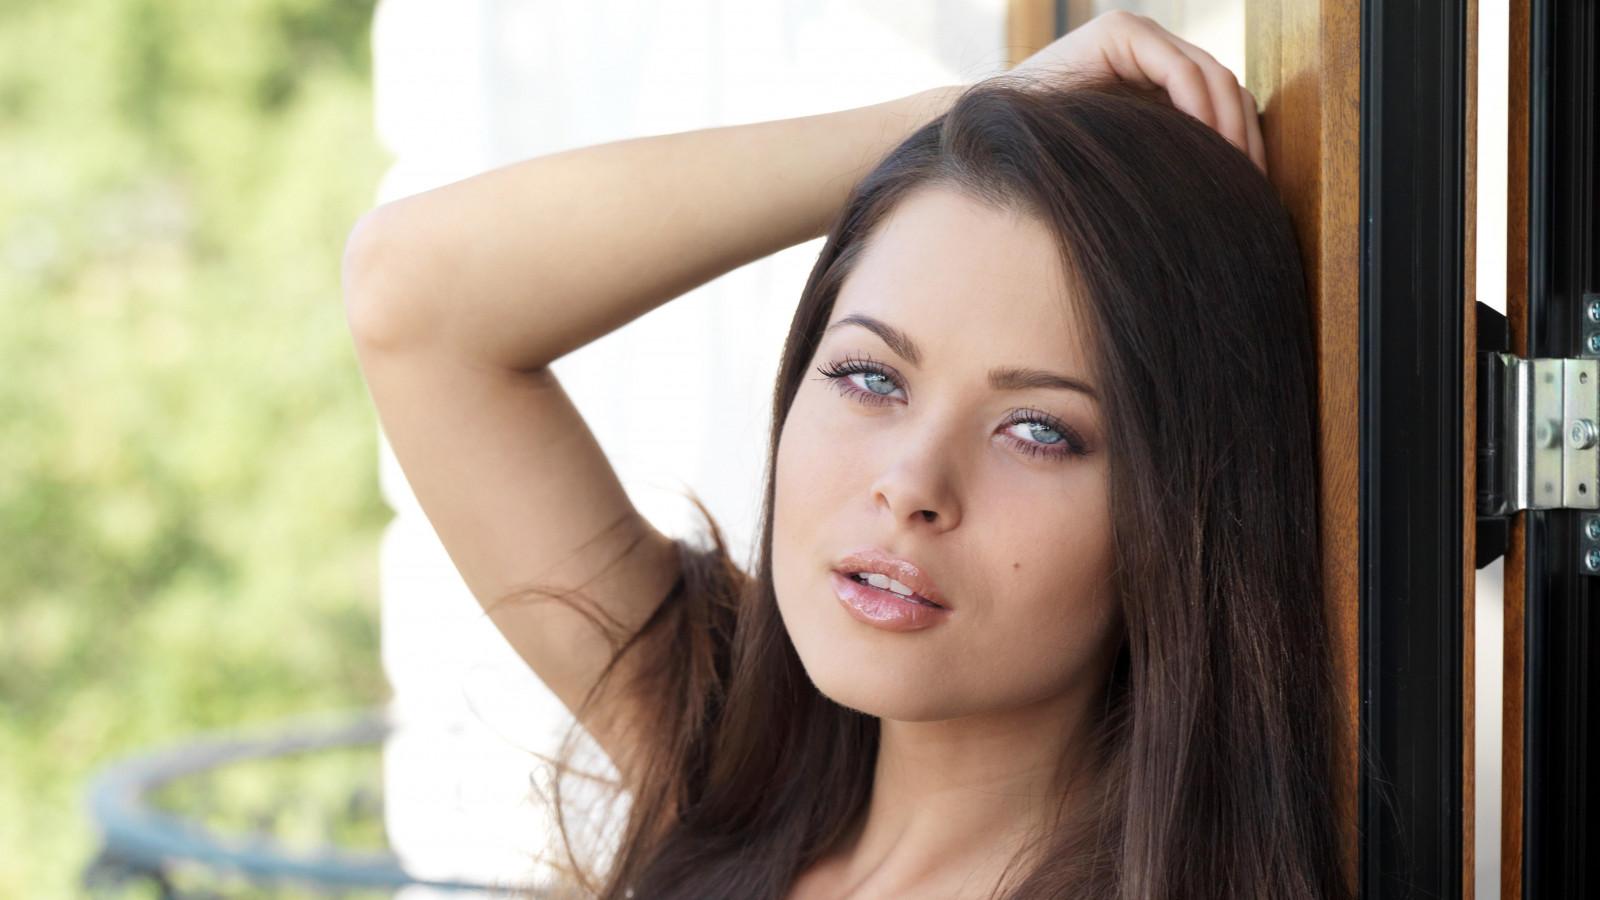 Wallpaper : face, women, model, blue eyes, brunette, hands